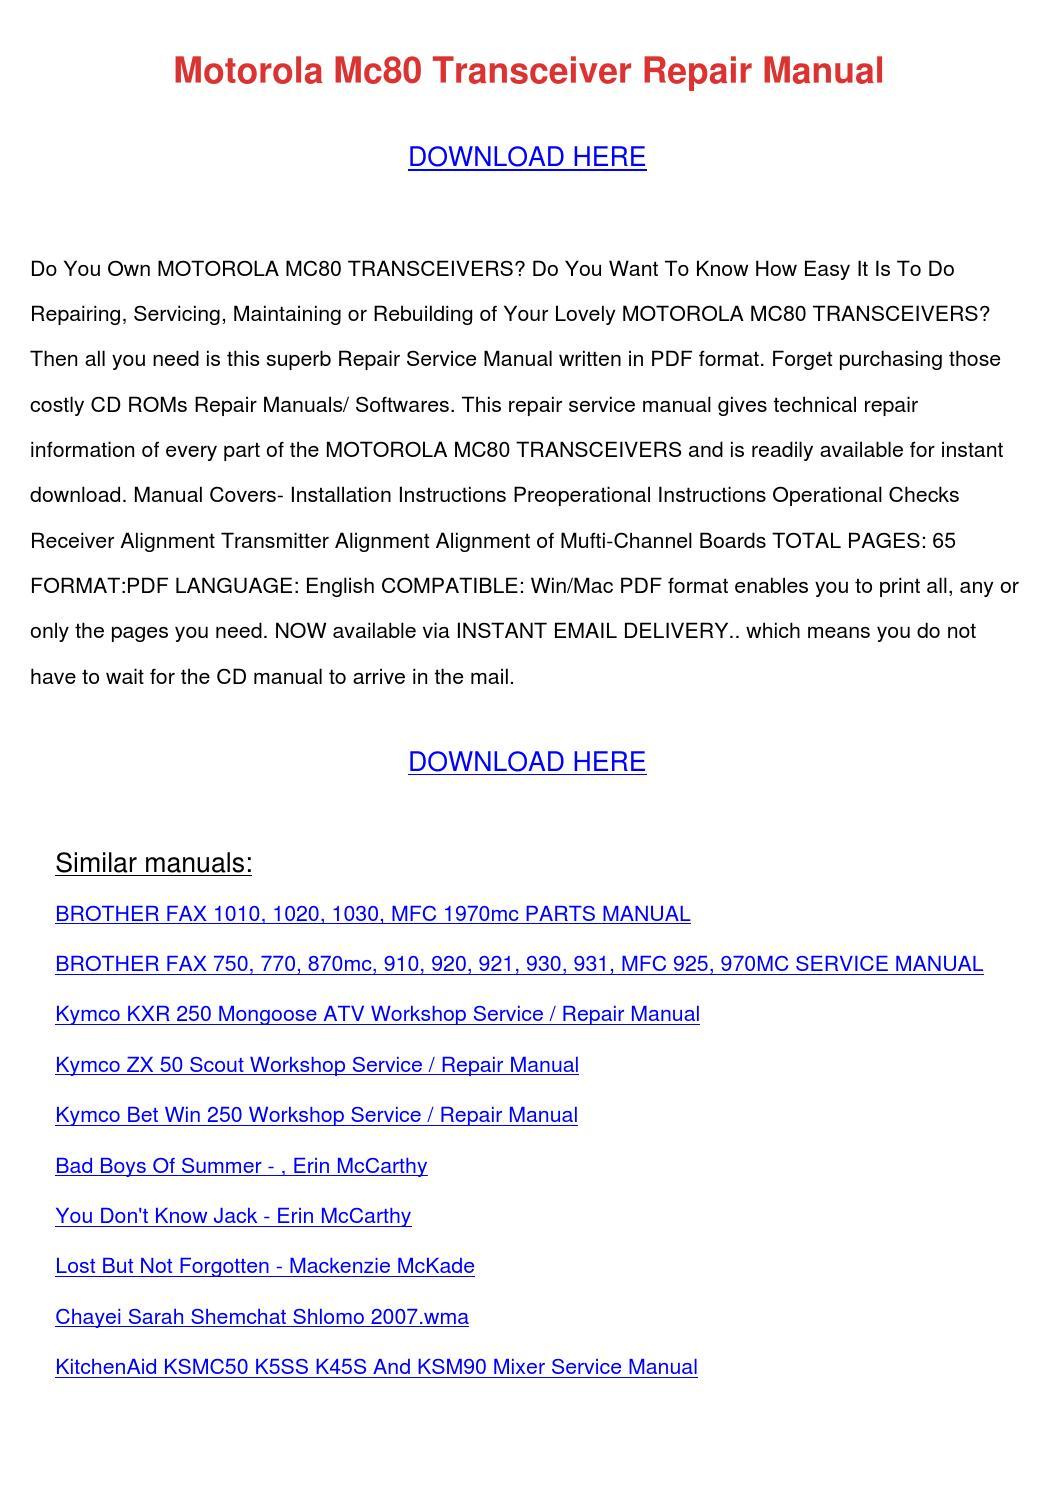 motorola mc80 transceiver repair manual by rodneyraymond issuu rh issuu com Jabra Bluetooth Manual Motorola Droid Turbo